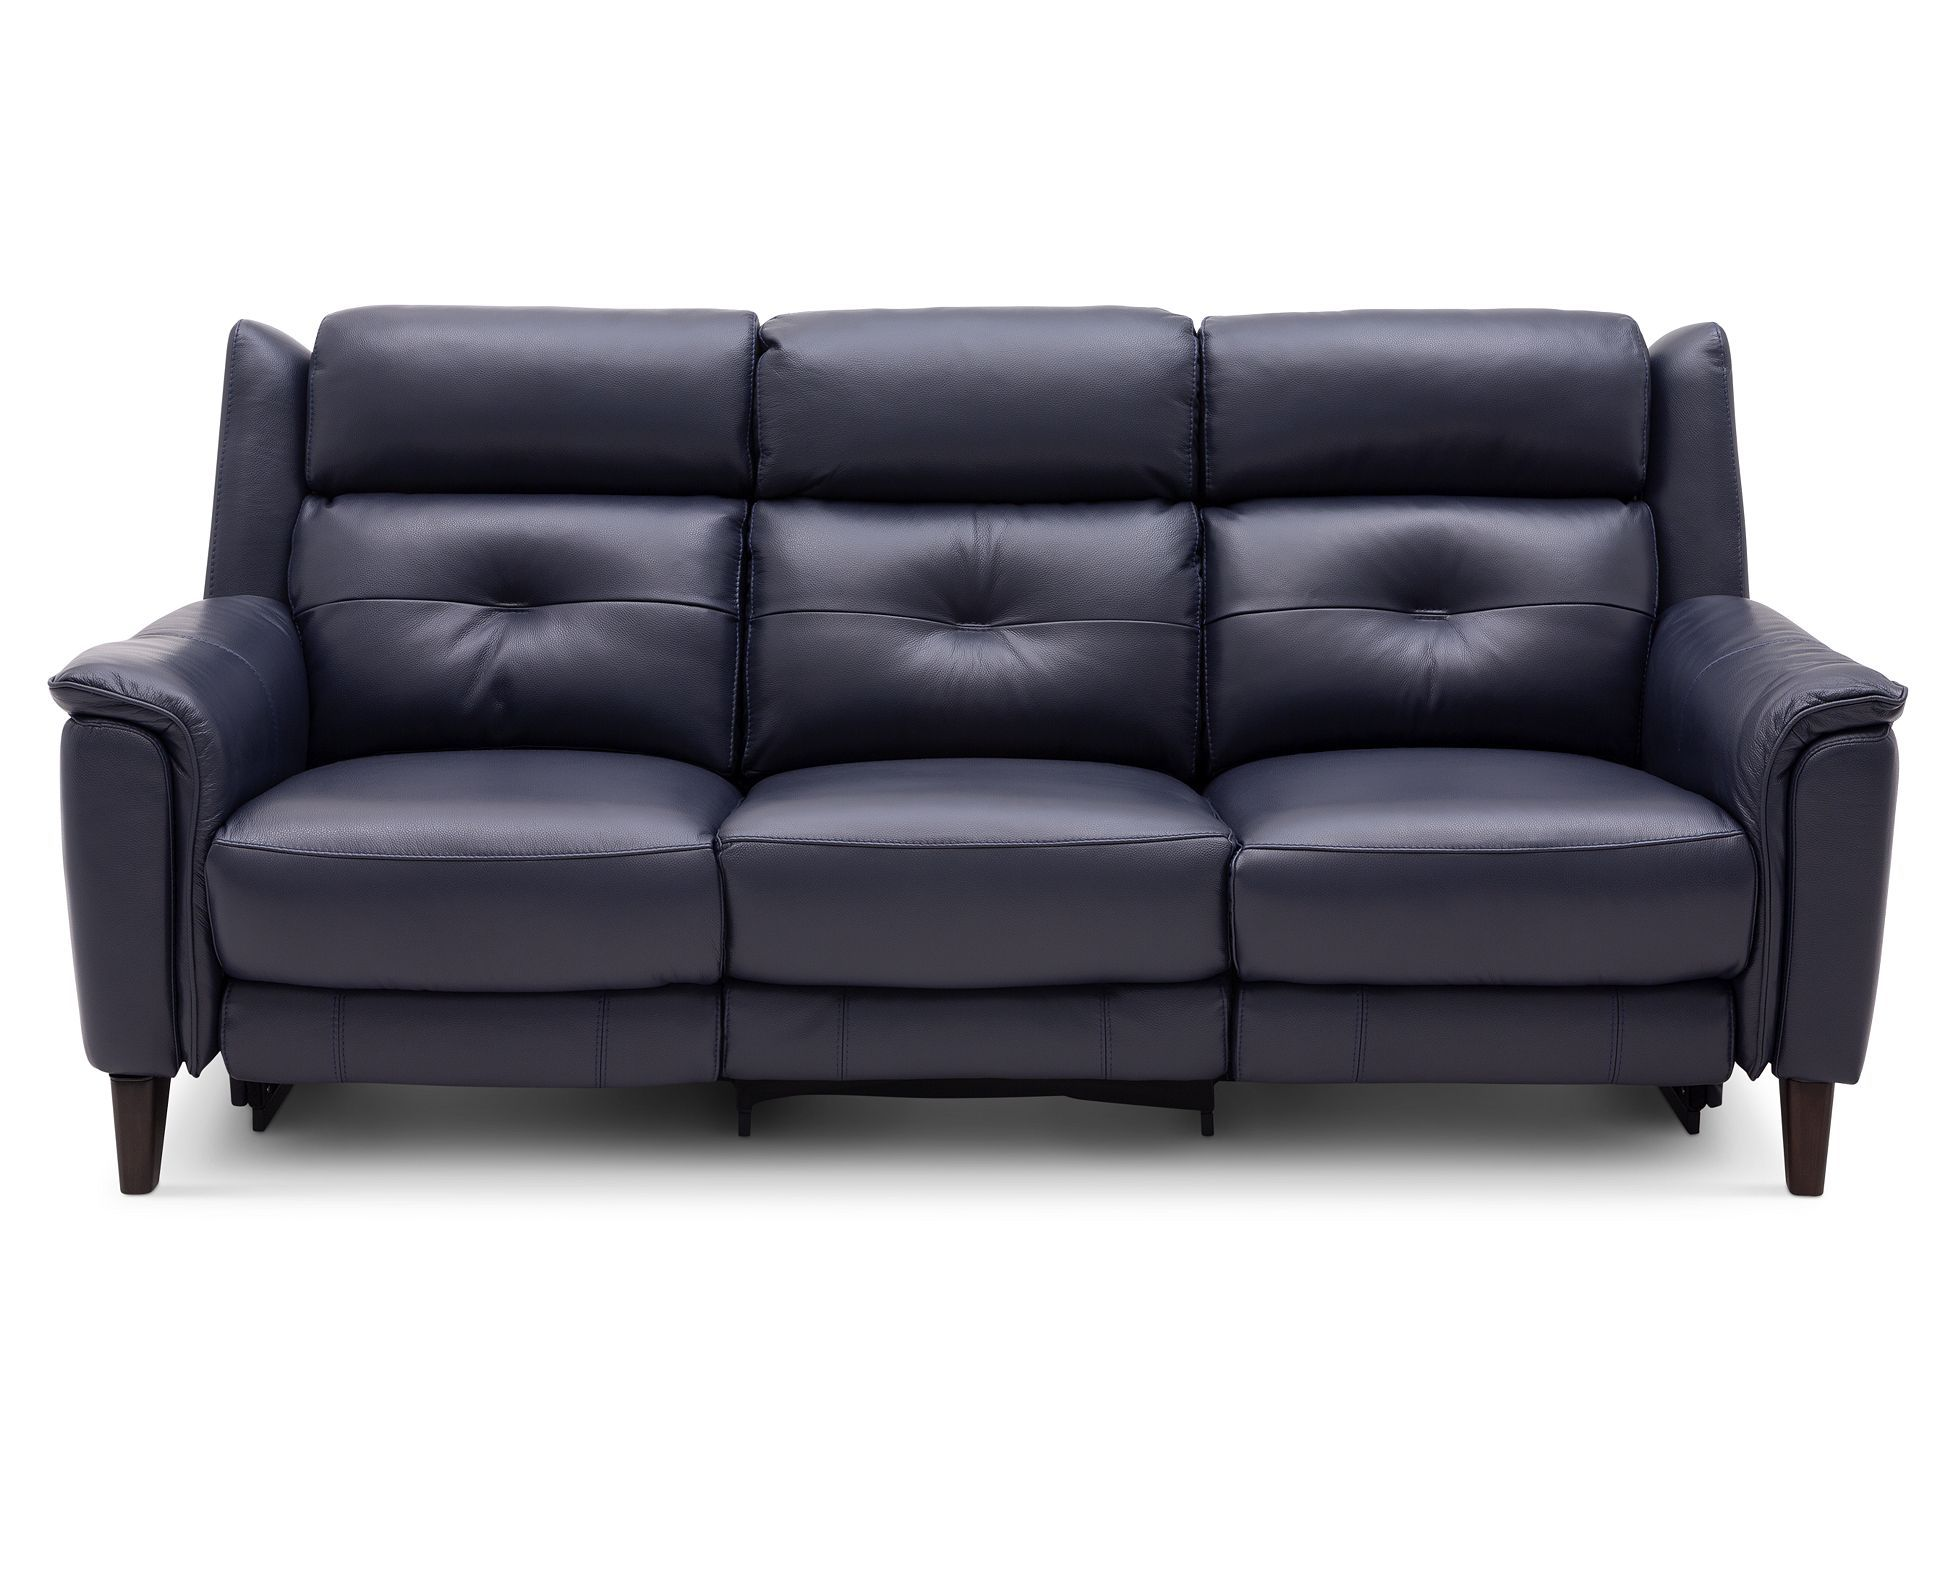 Light Blue Leather Recliner Sofa